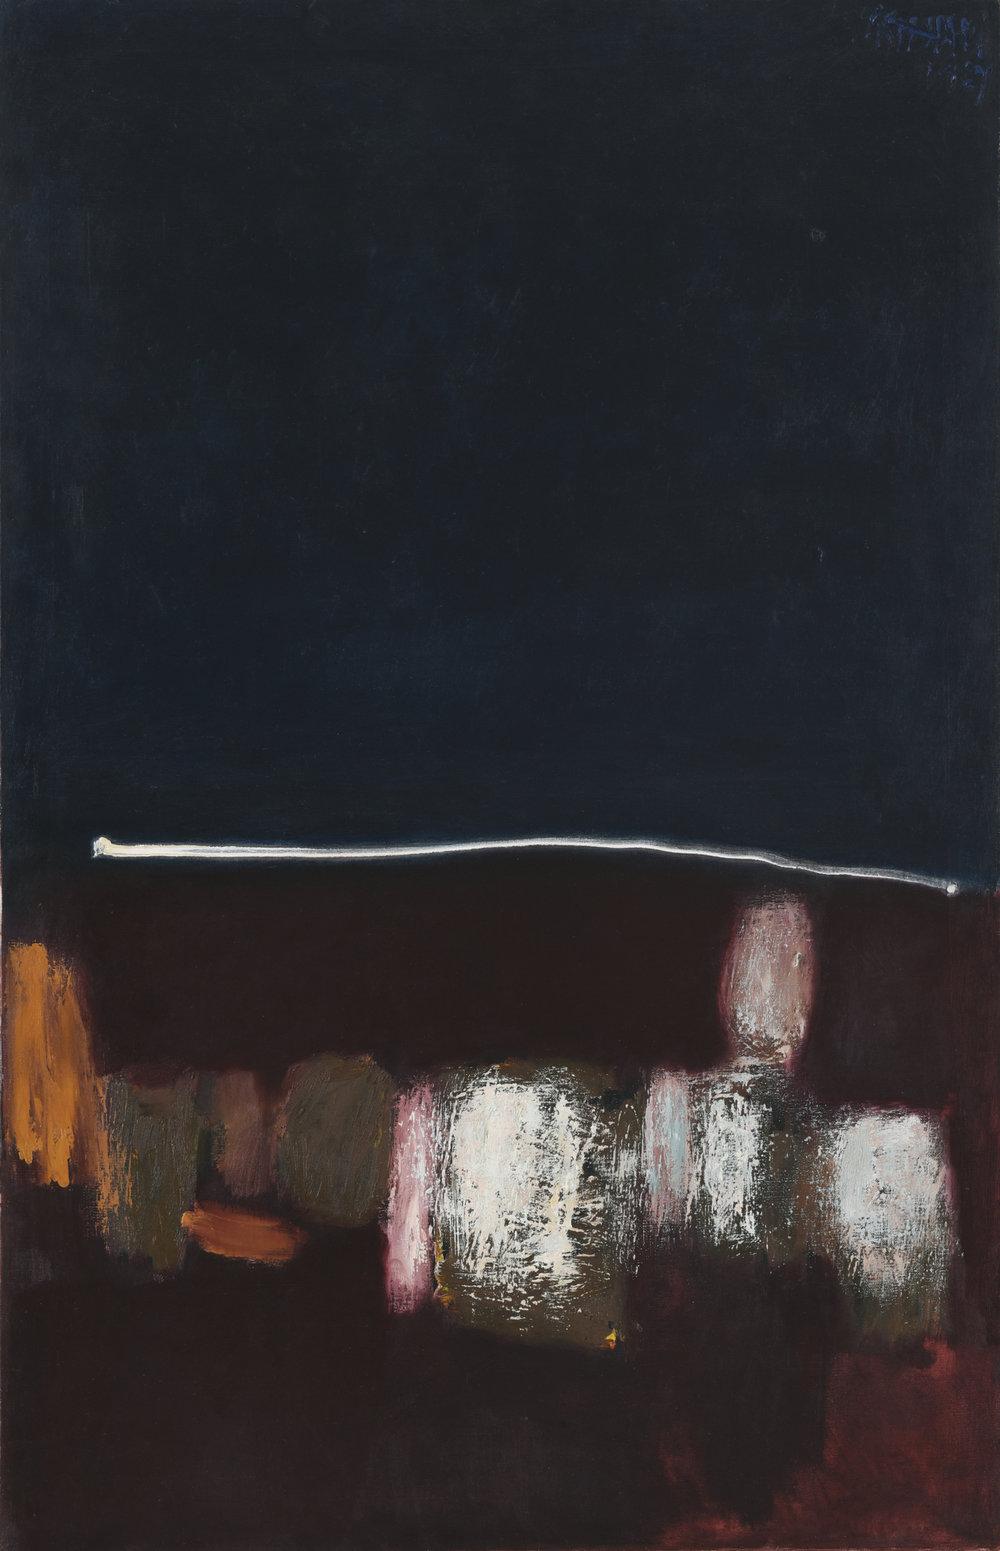 Srihadi Soedarsono, Seascape, oil on canvas, 142.5 x 92.5 cm, 1967